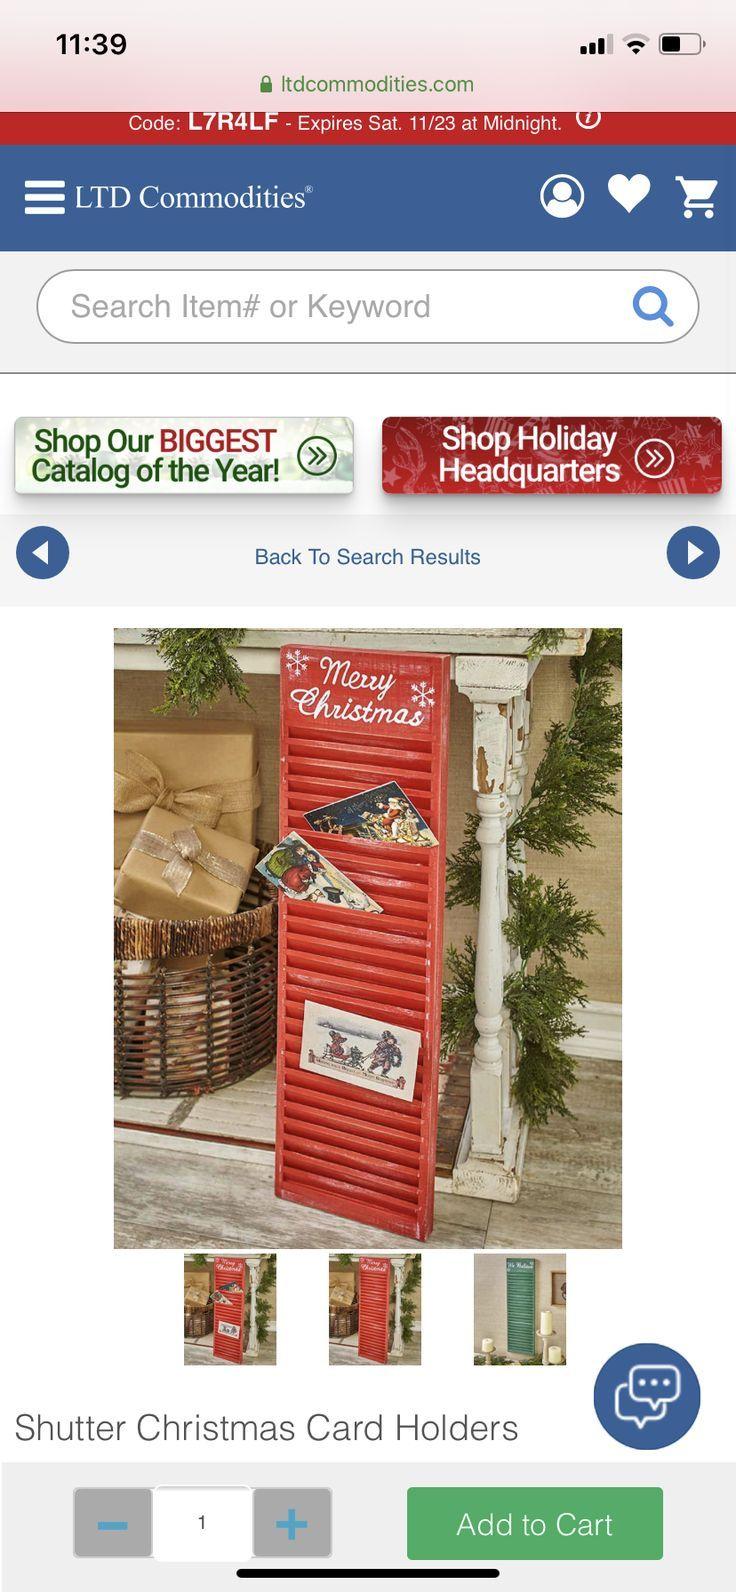 Ltd Commodities Catalog Christmas 2020 Ltd Commodities Catalog Christmas in 2020 | Christmas card holders